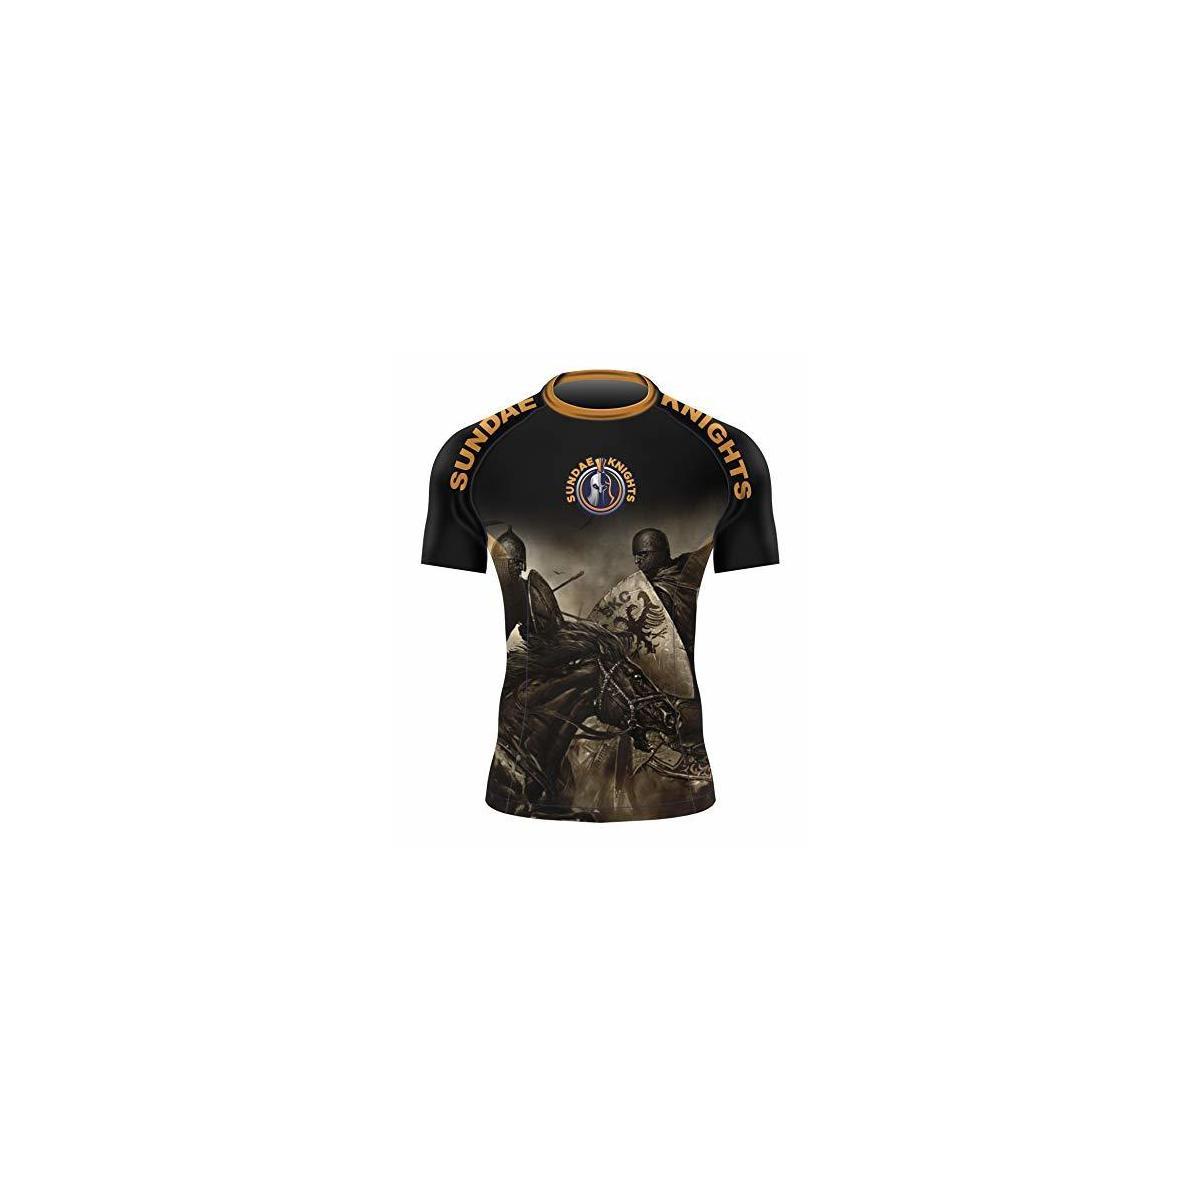 Warrior Edition Short Sleeve BJJ Rashguard, NoGi, Gi, Compression top Base Layer (Large) Black